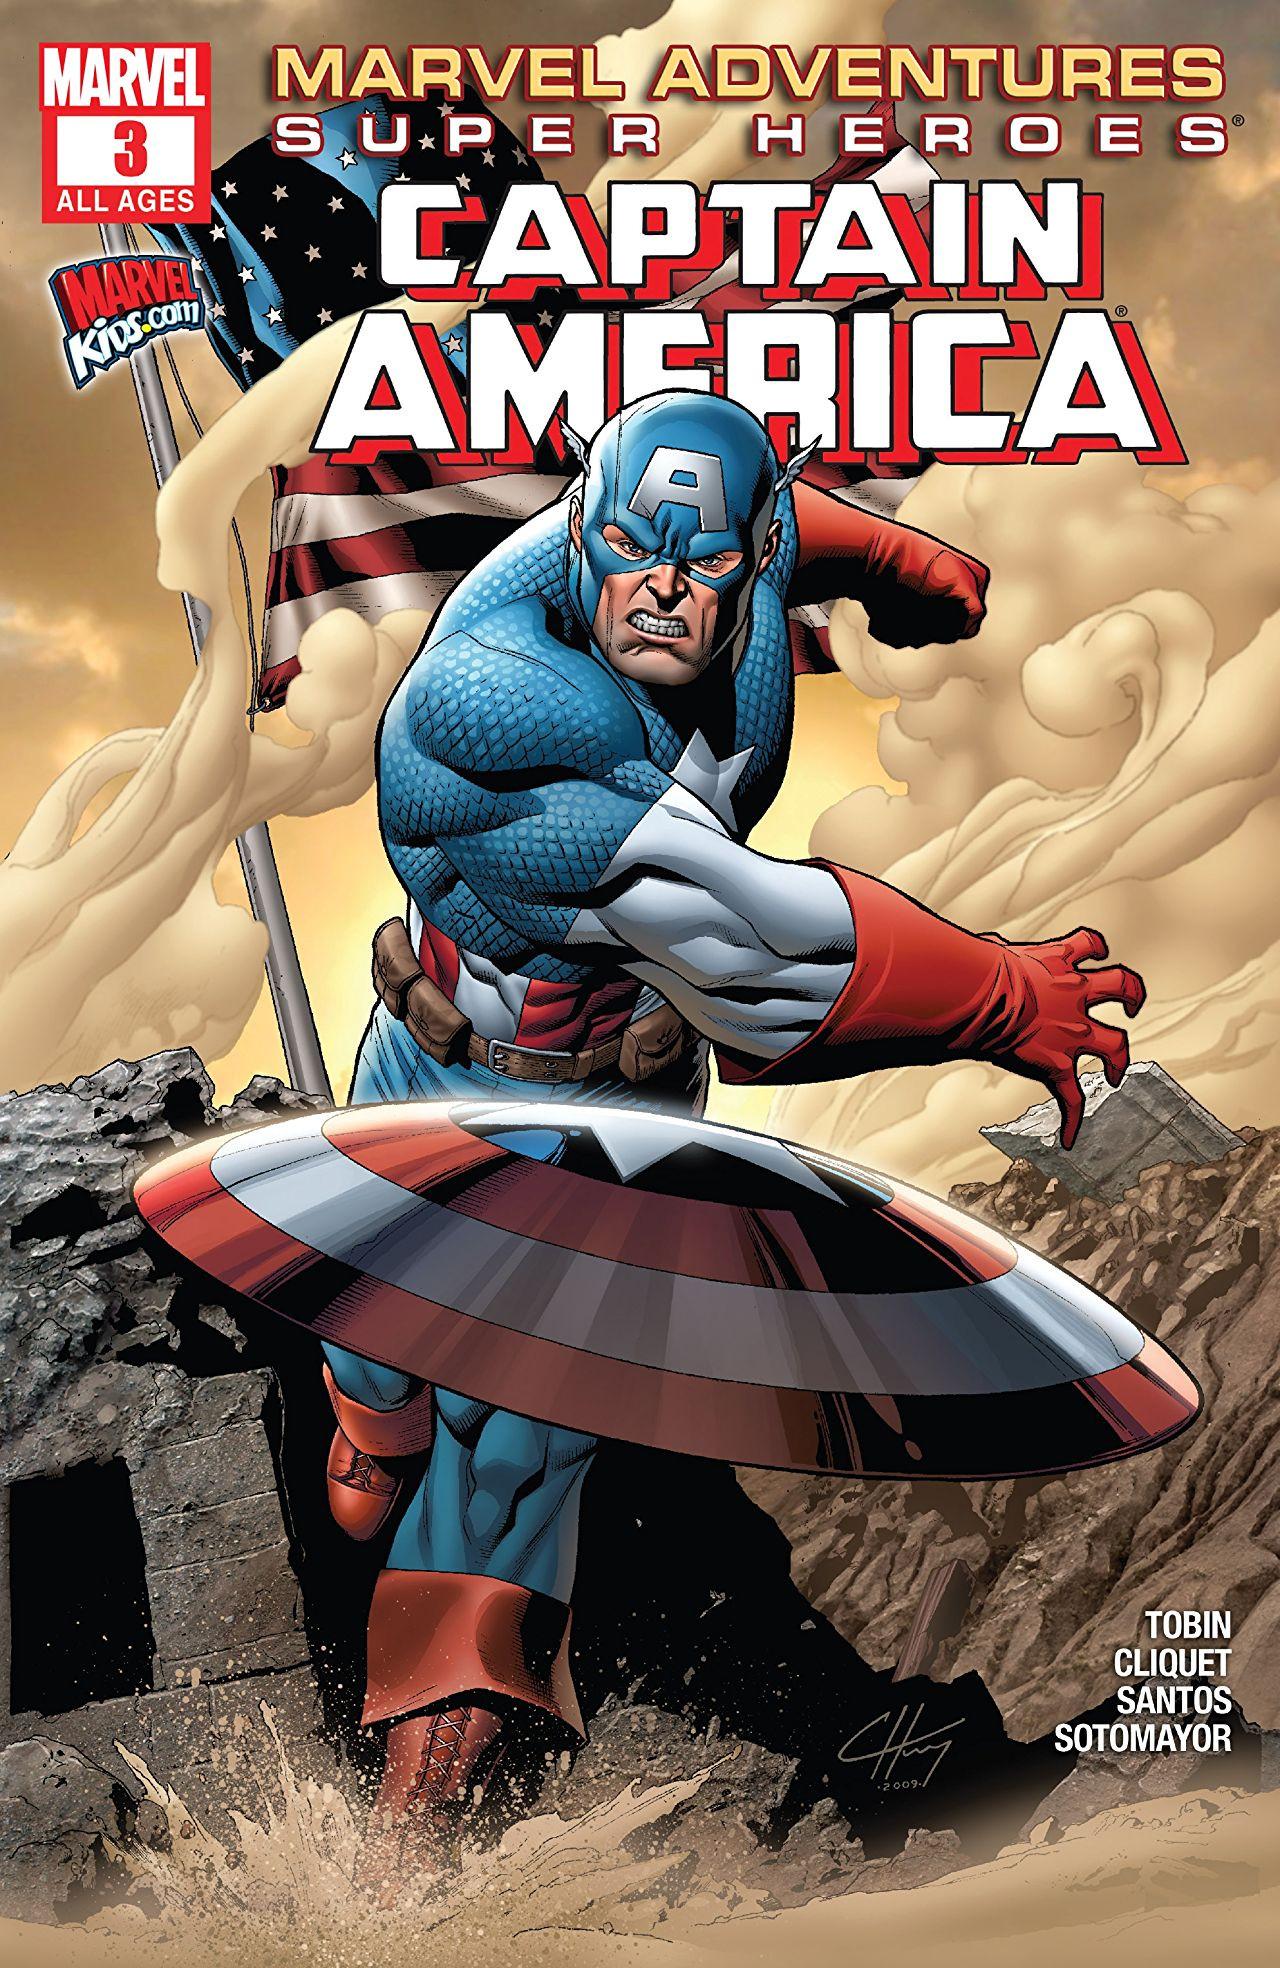 Marvel Adventures: Super Heroes Vol 2 3